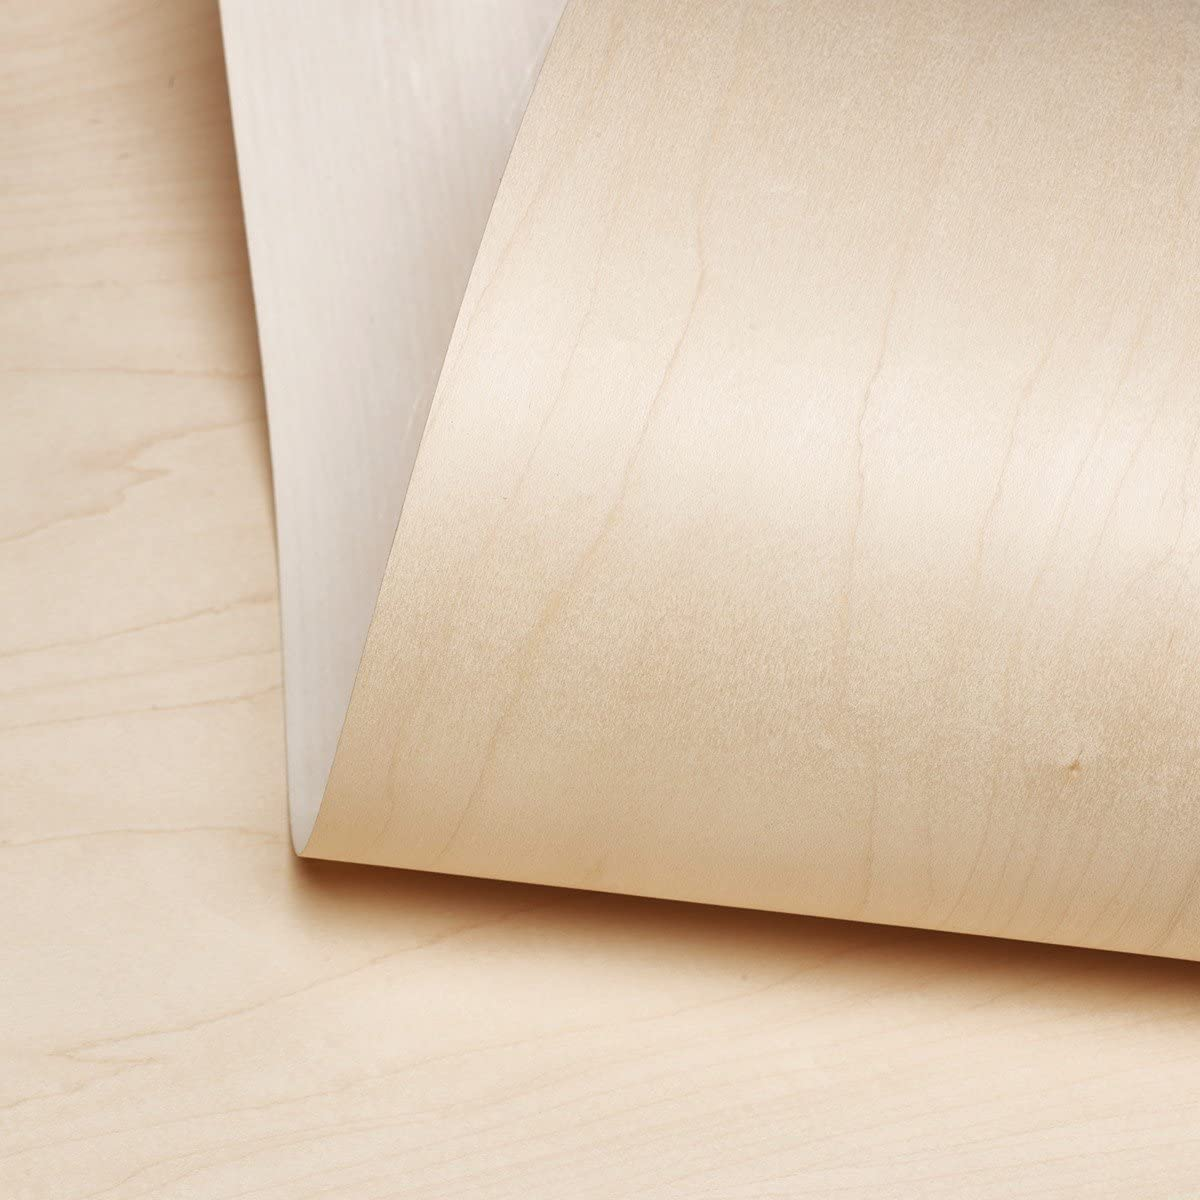 "Edge Supply Birch Wood Veneer Sheet Rotary, 24"" x 96"", 10 mil Paper Back, ""A"" Grade Veneer Face – Easy Apply with Contact Adhesive Birch Veneer Sheet – Veneer Sheets for Restoration of Furniture"